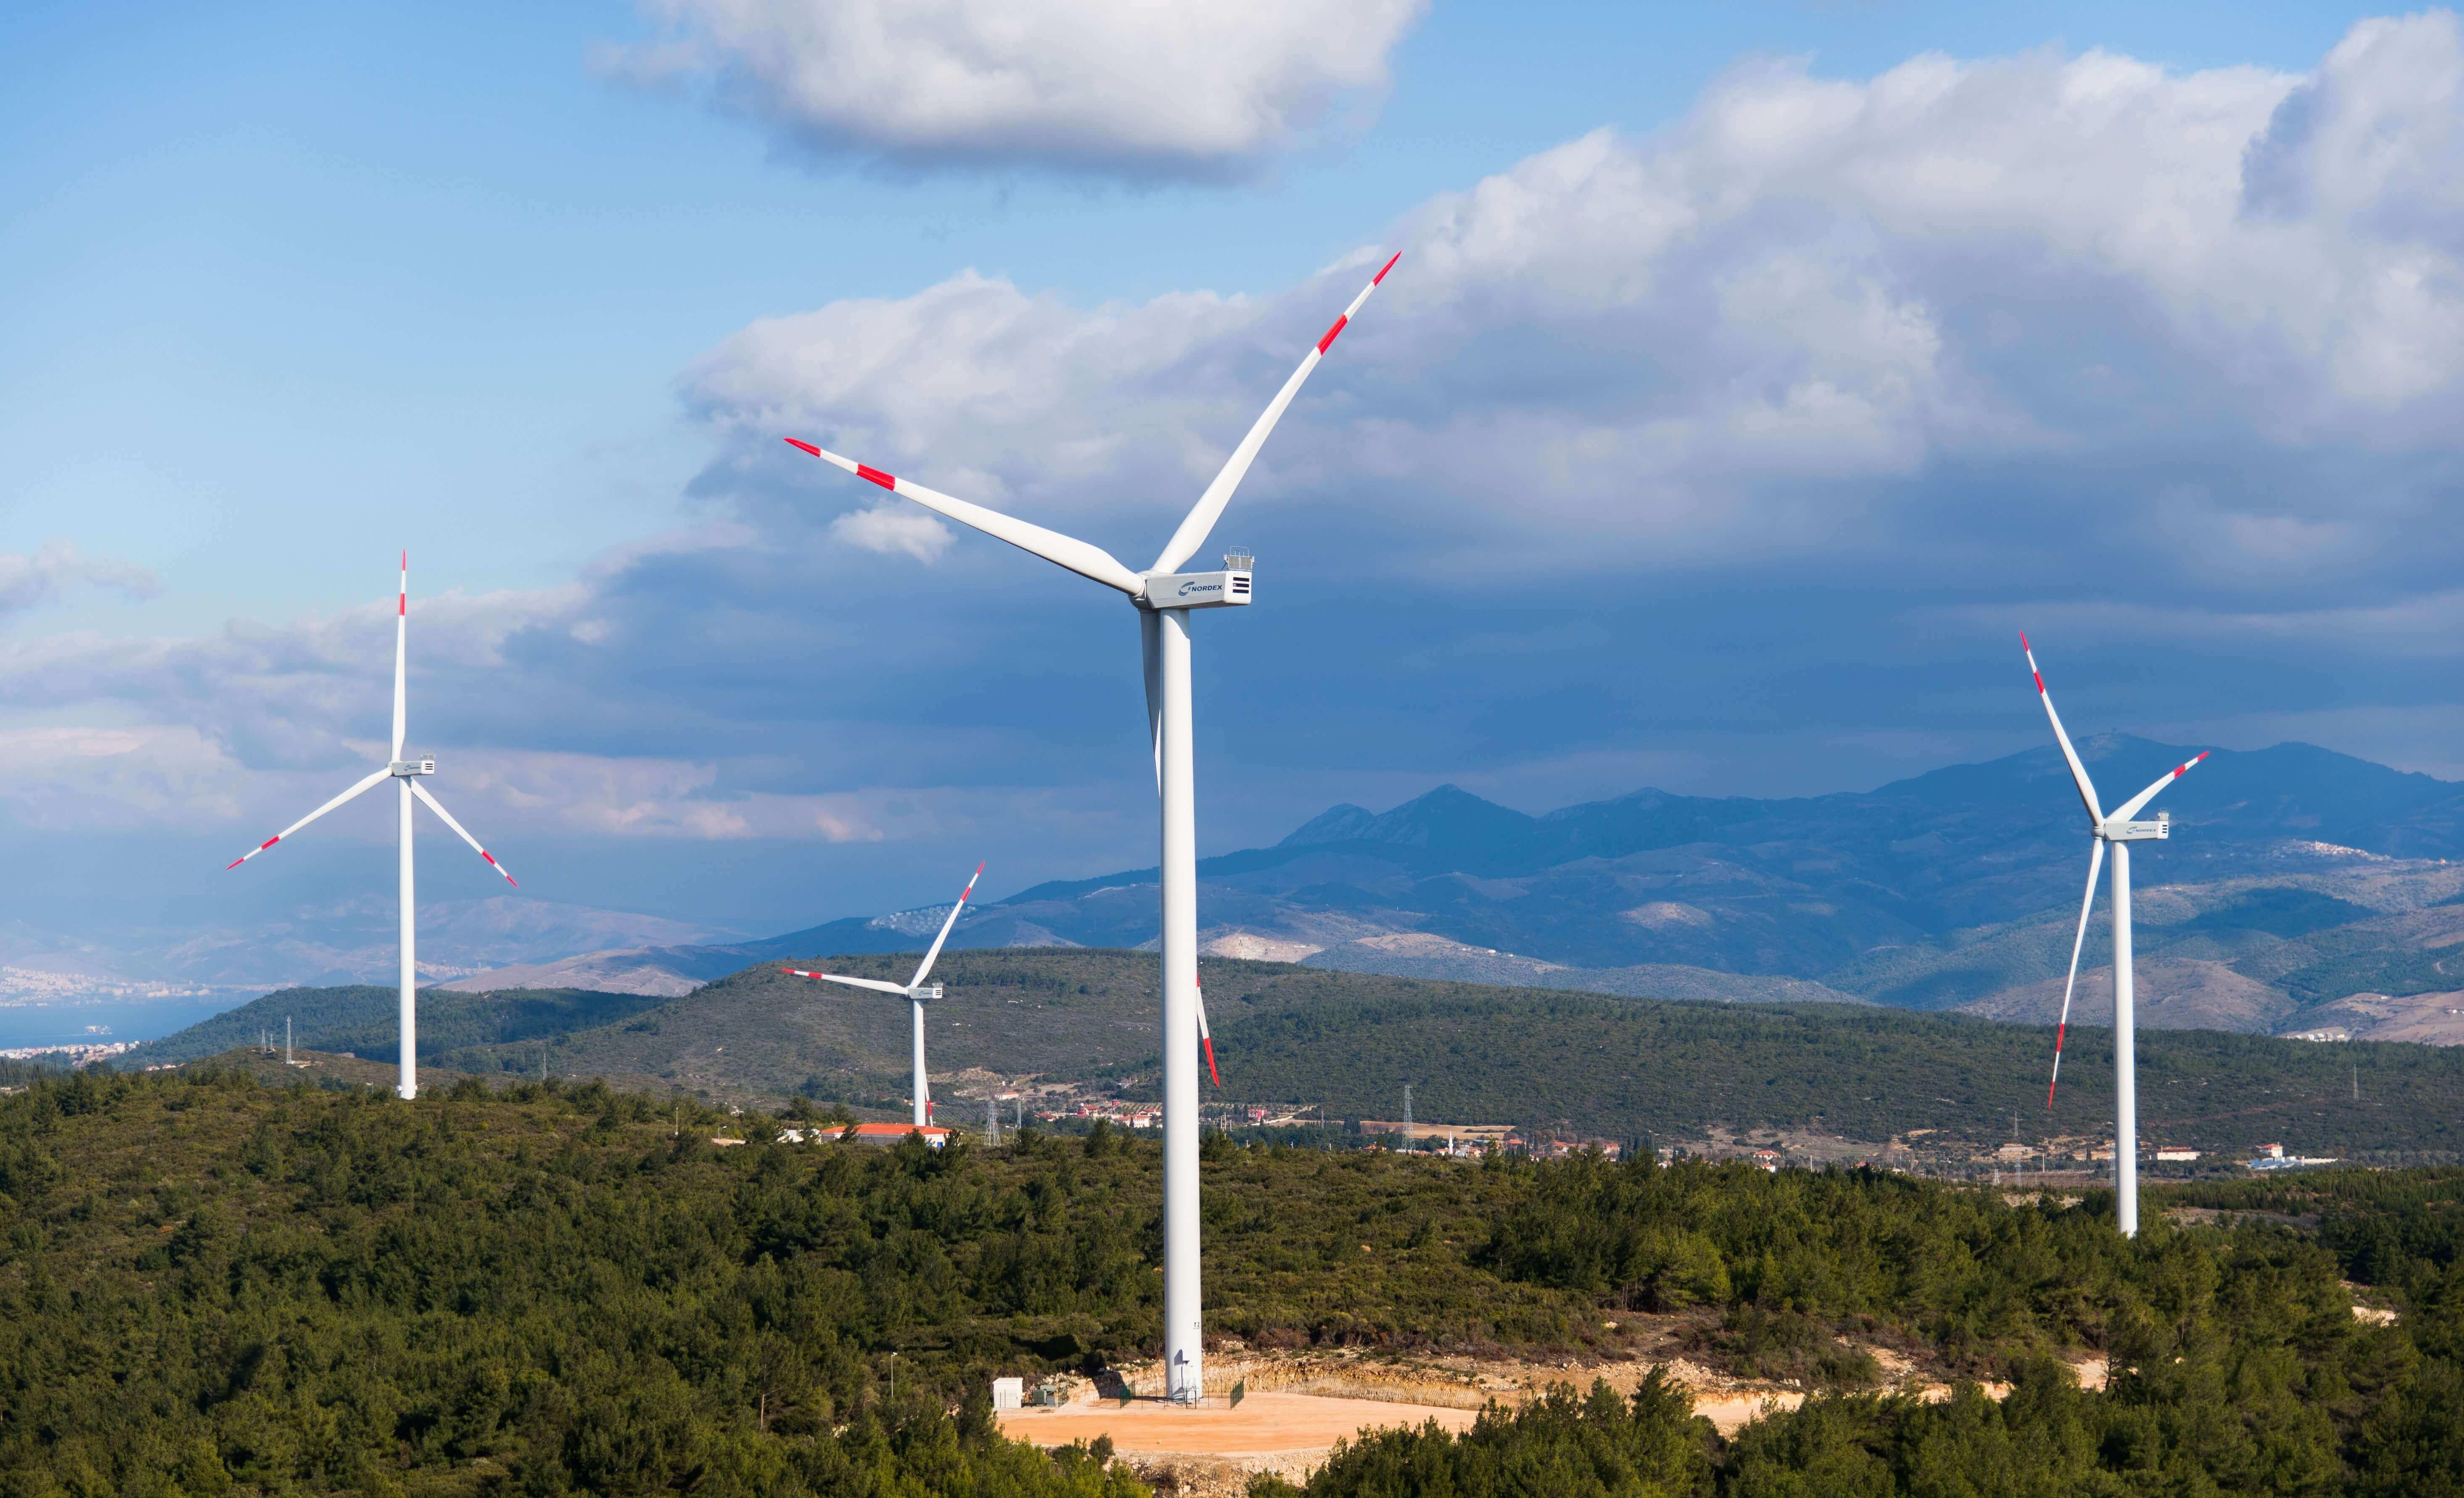 Turkey Nordex To Provide Turbines For 39 MW Eber Wind Farm